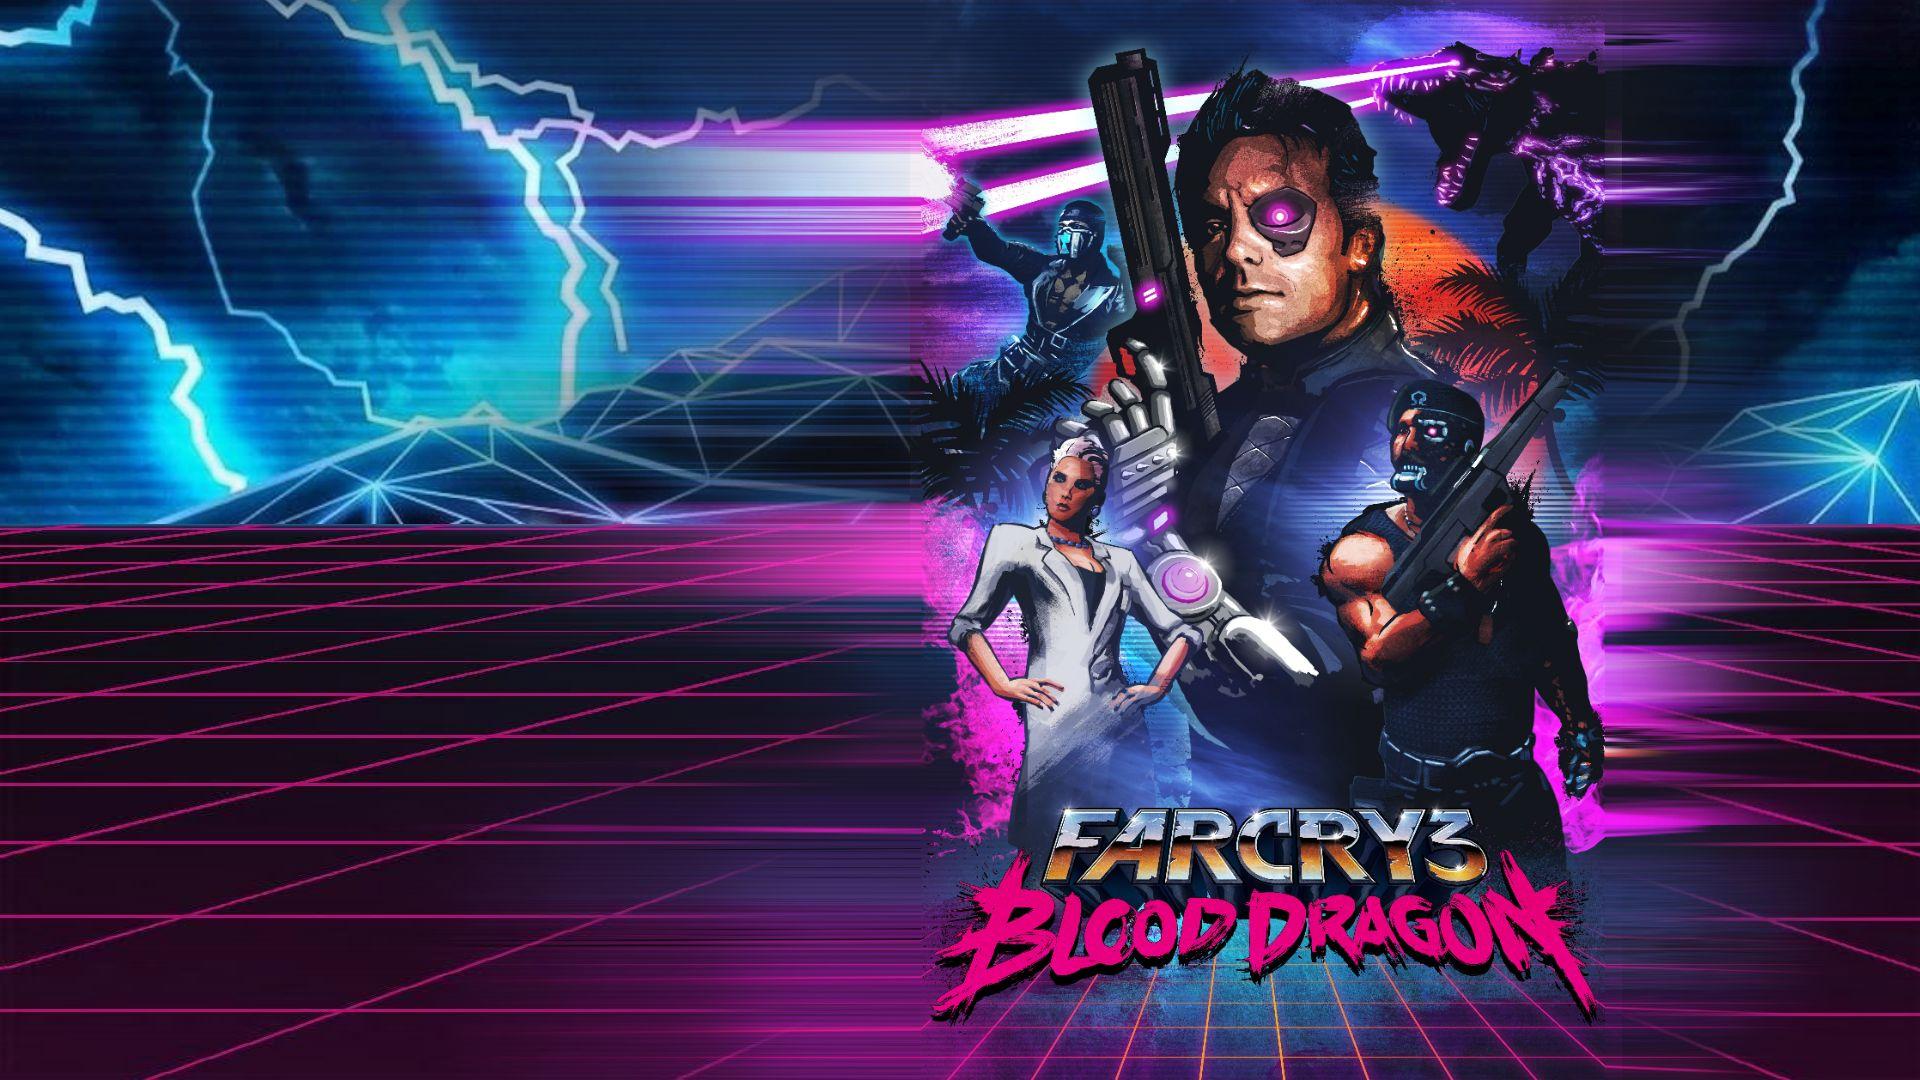 Far Cry 3 Blood Dragon Details Launchbox Games Database